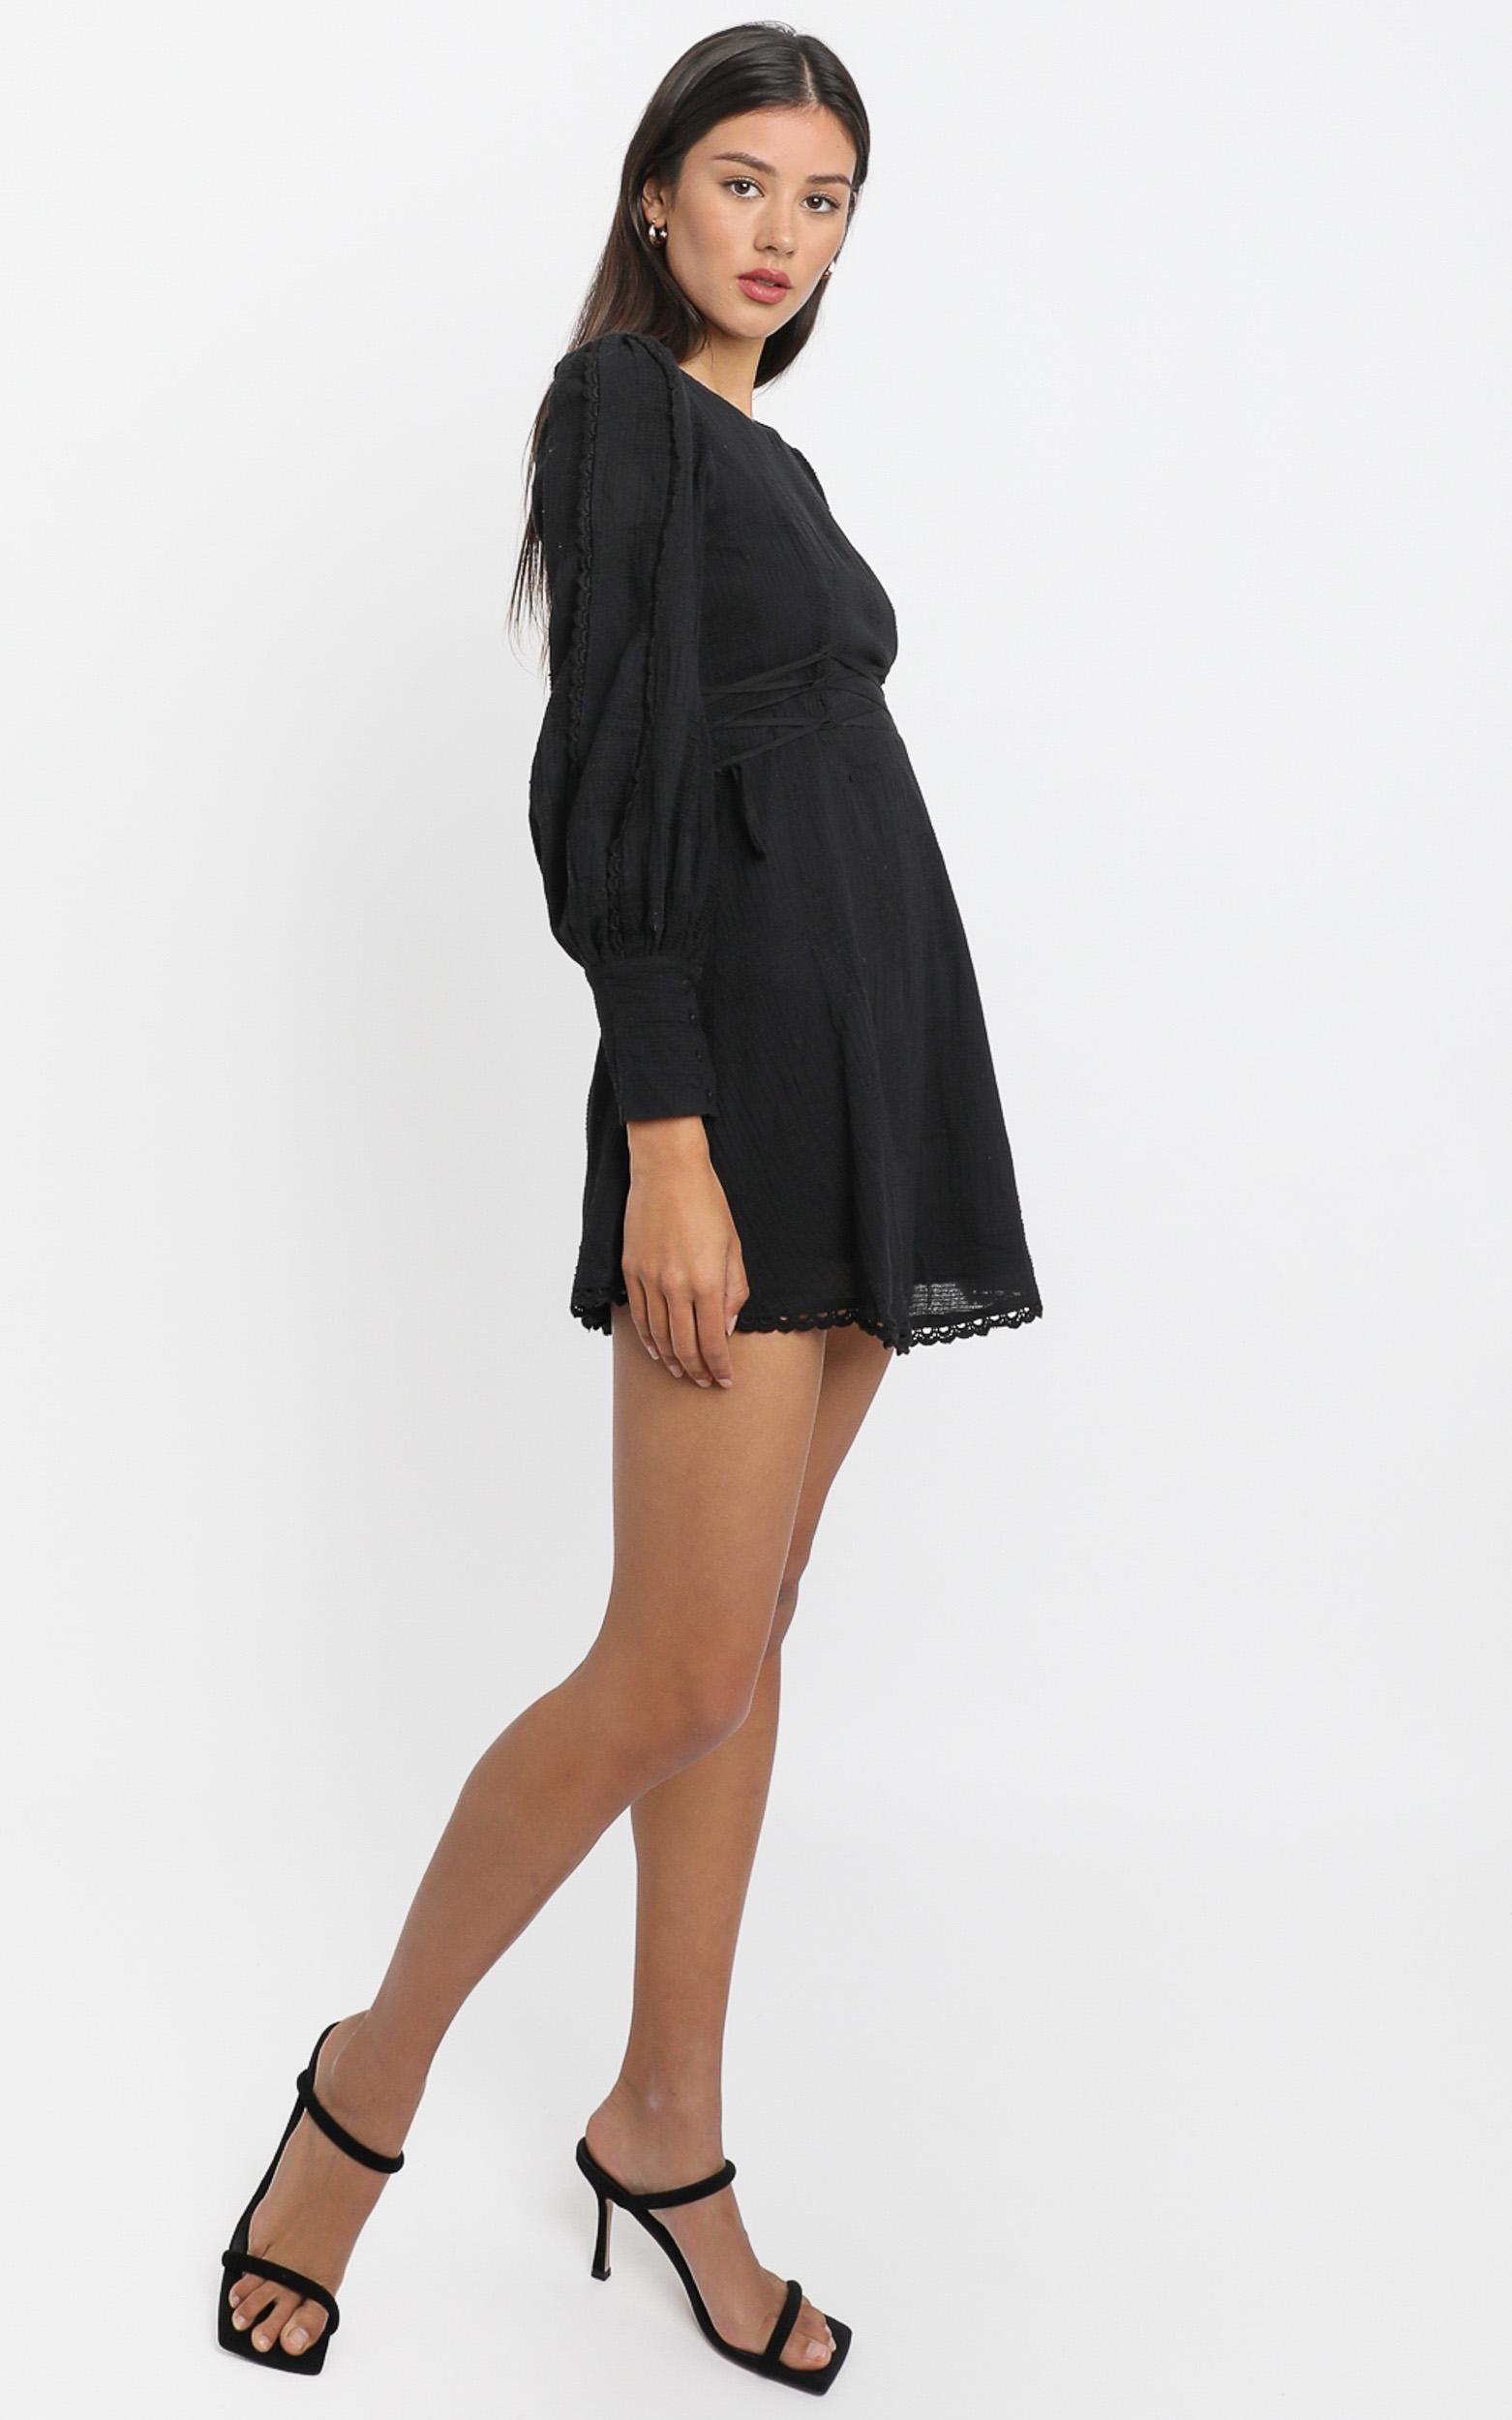 Reverie Dress in Black - 6 (XS), Black, hi-res image number null